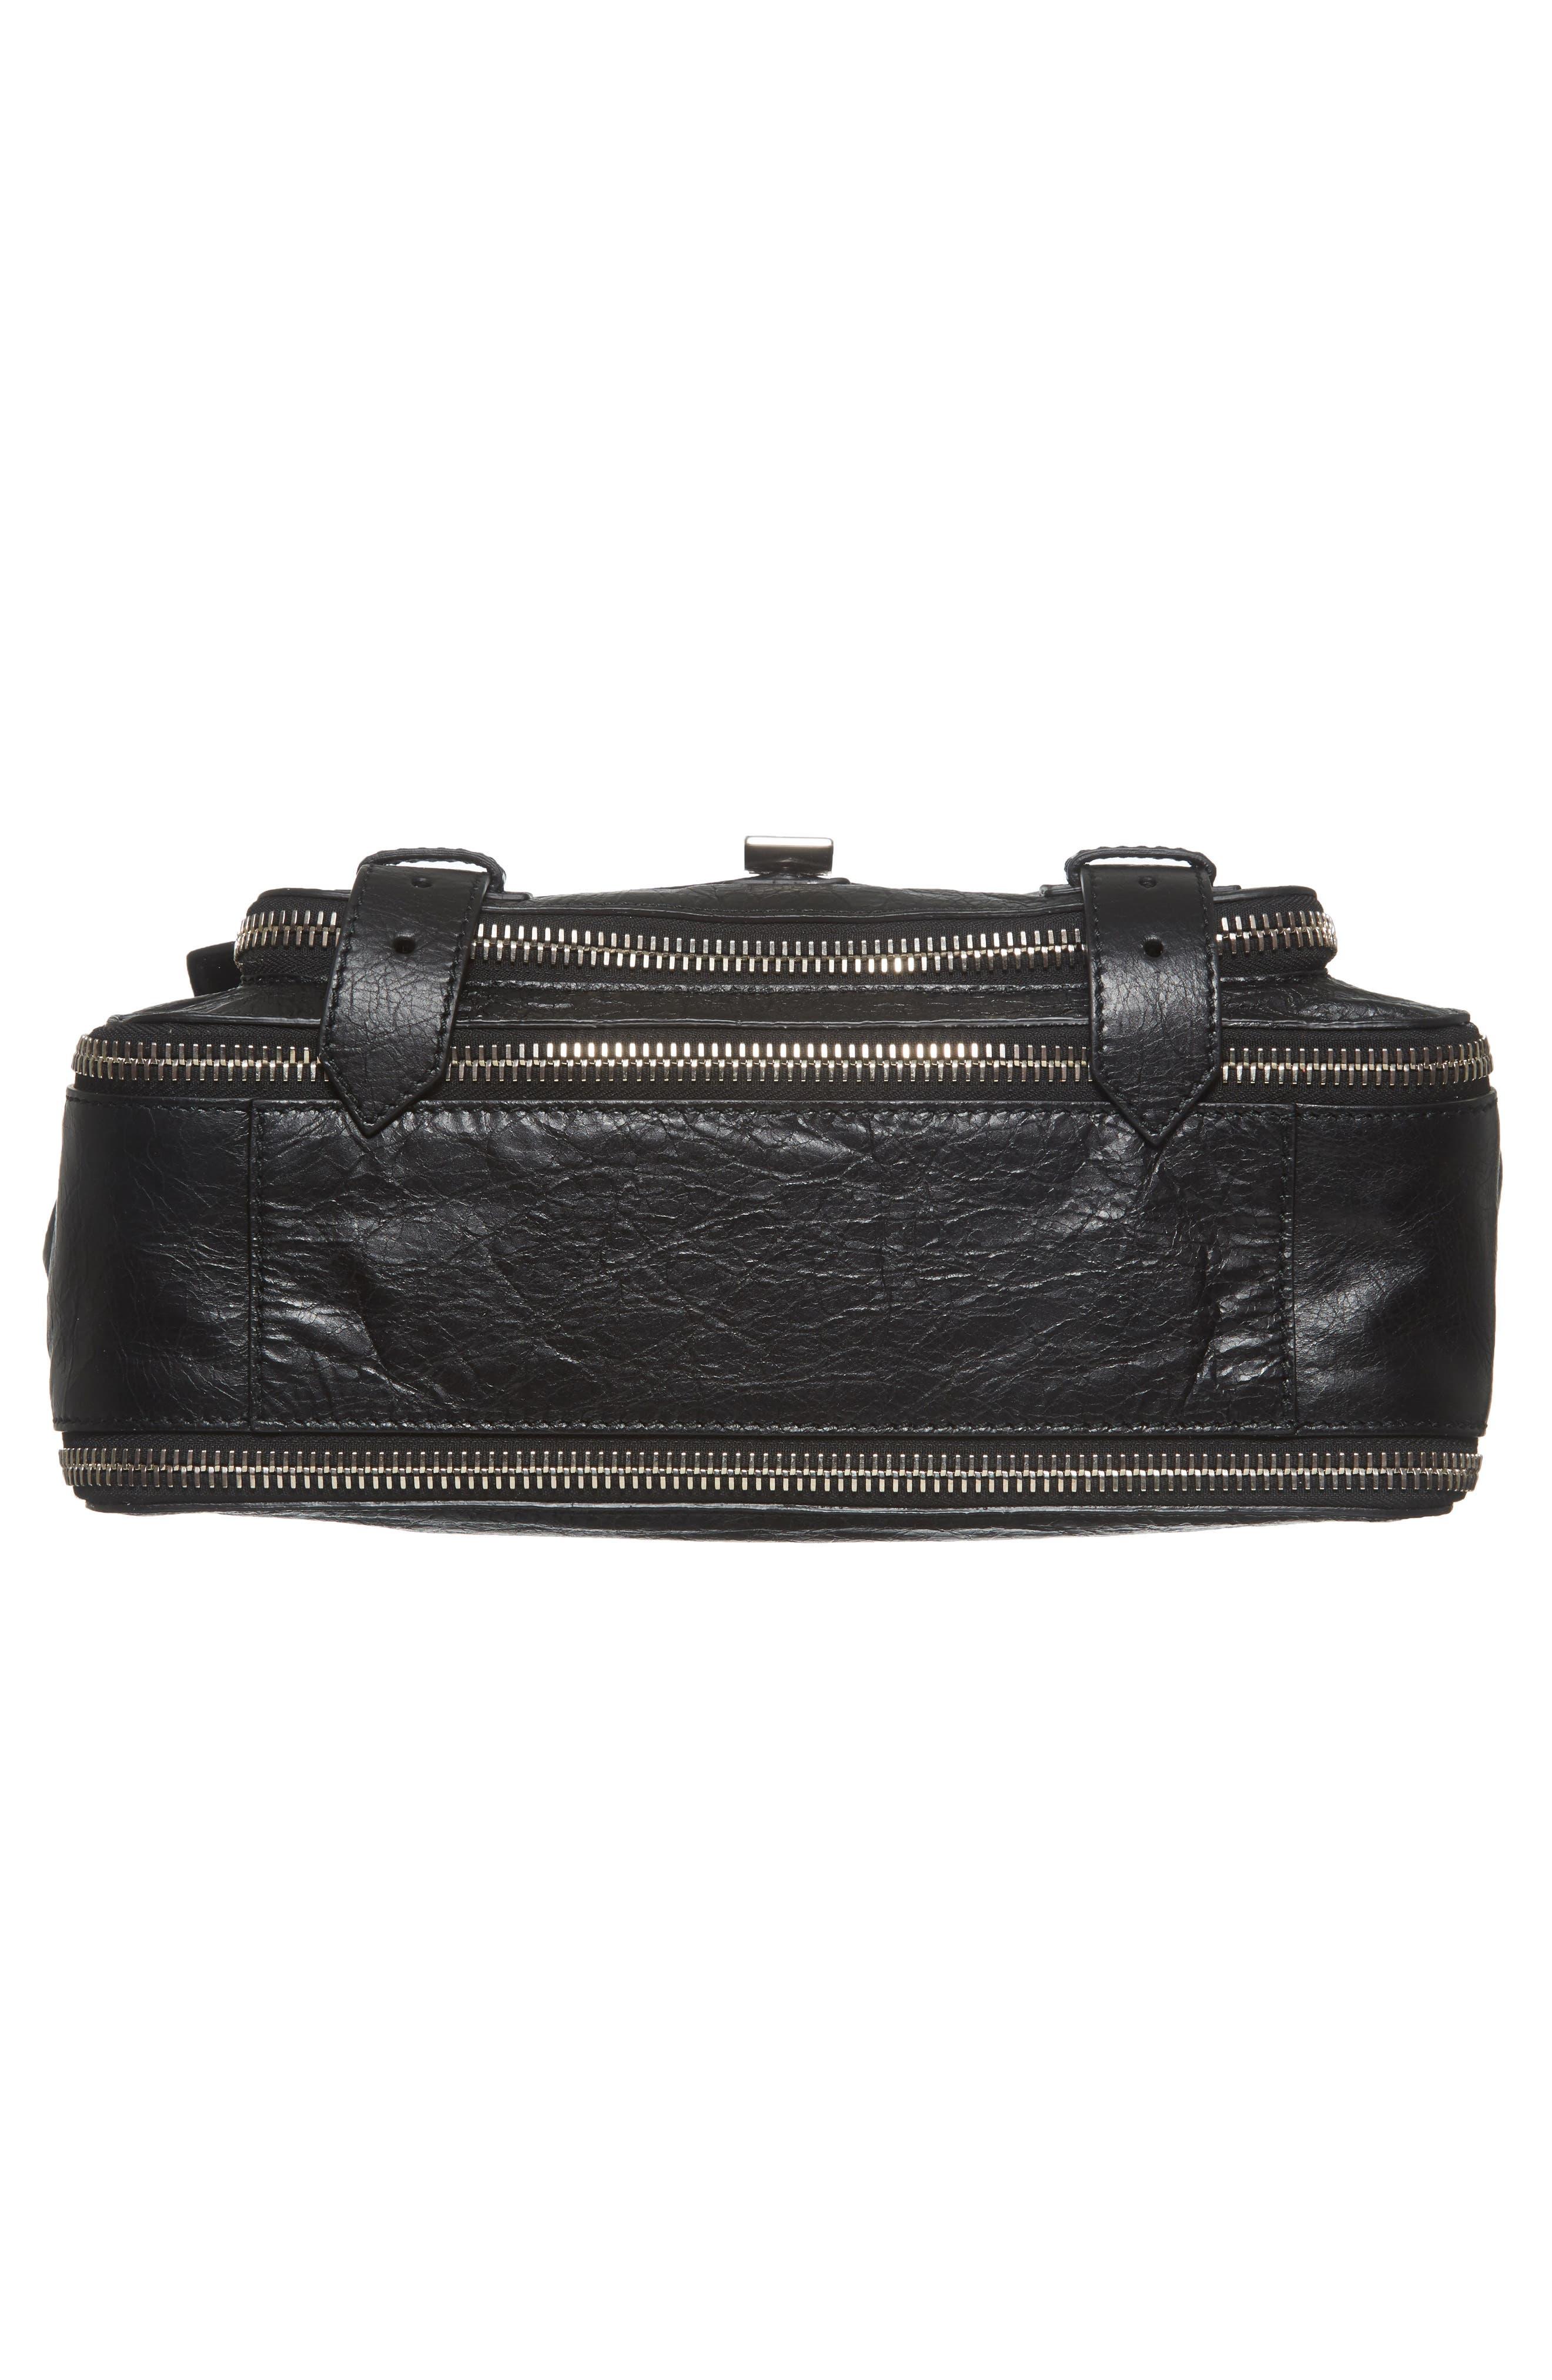 Medium PS1 Paper Leather Satchel,                             Alternate thumbnail 6, color,                             BLACK